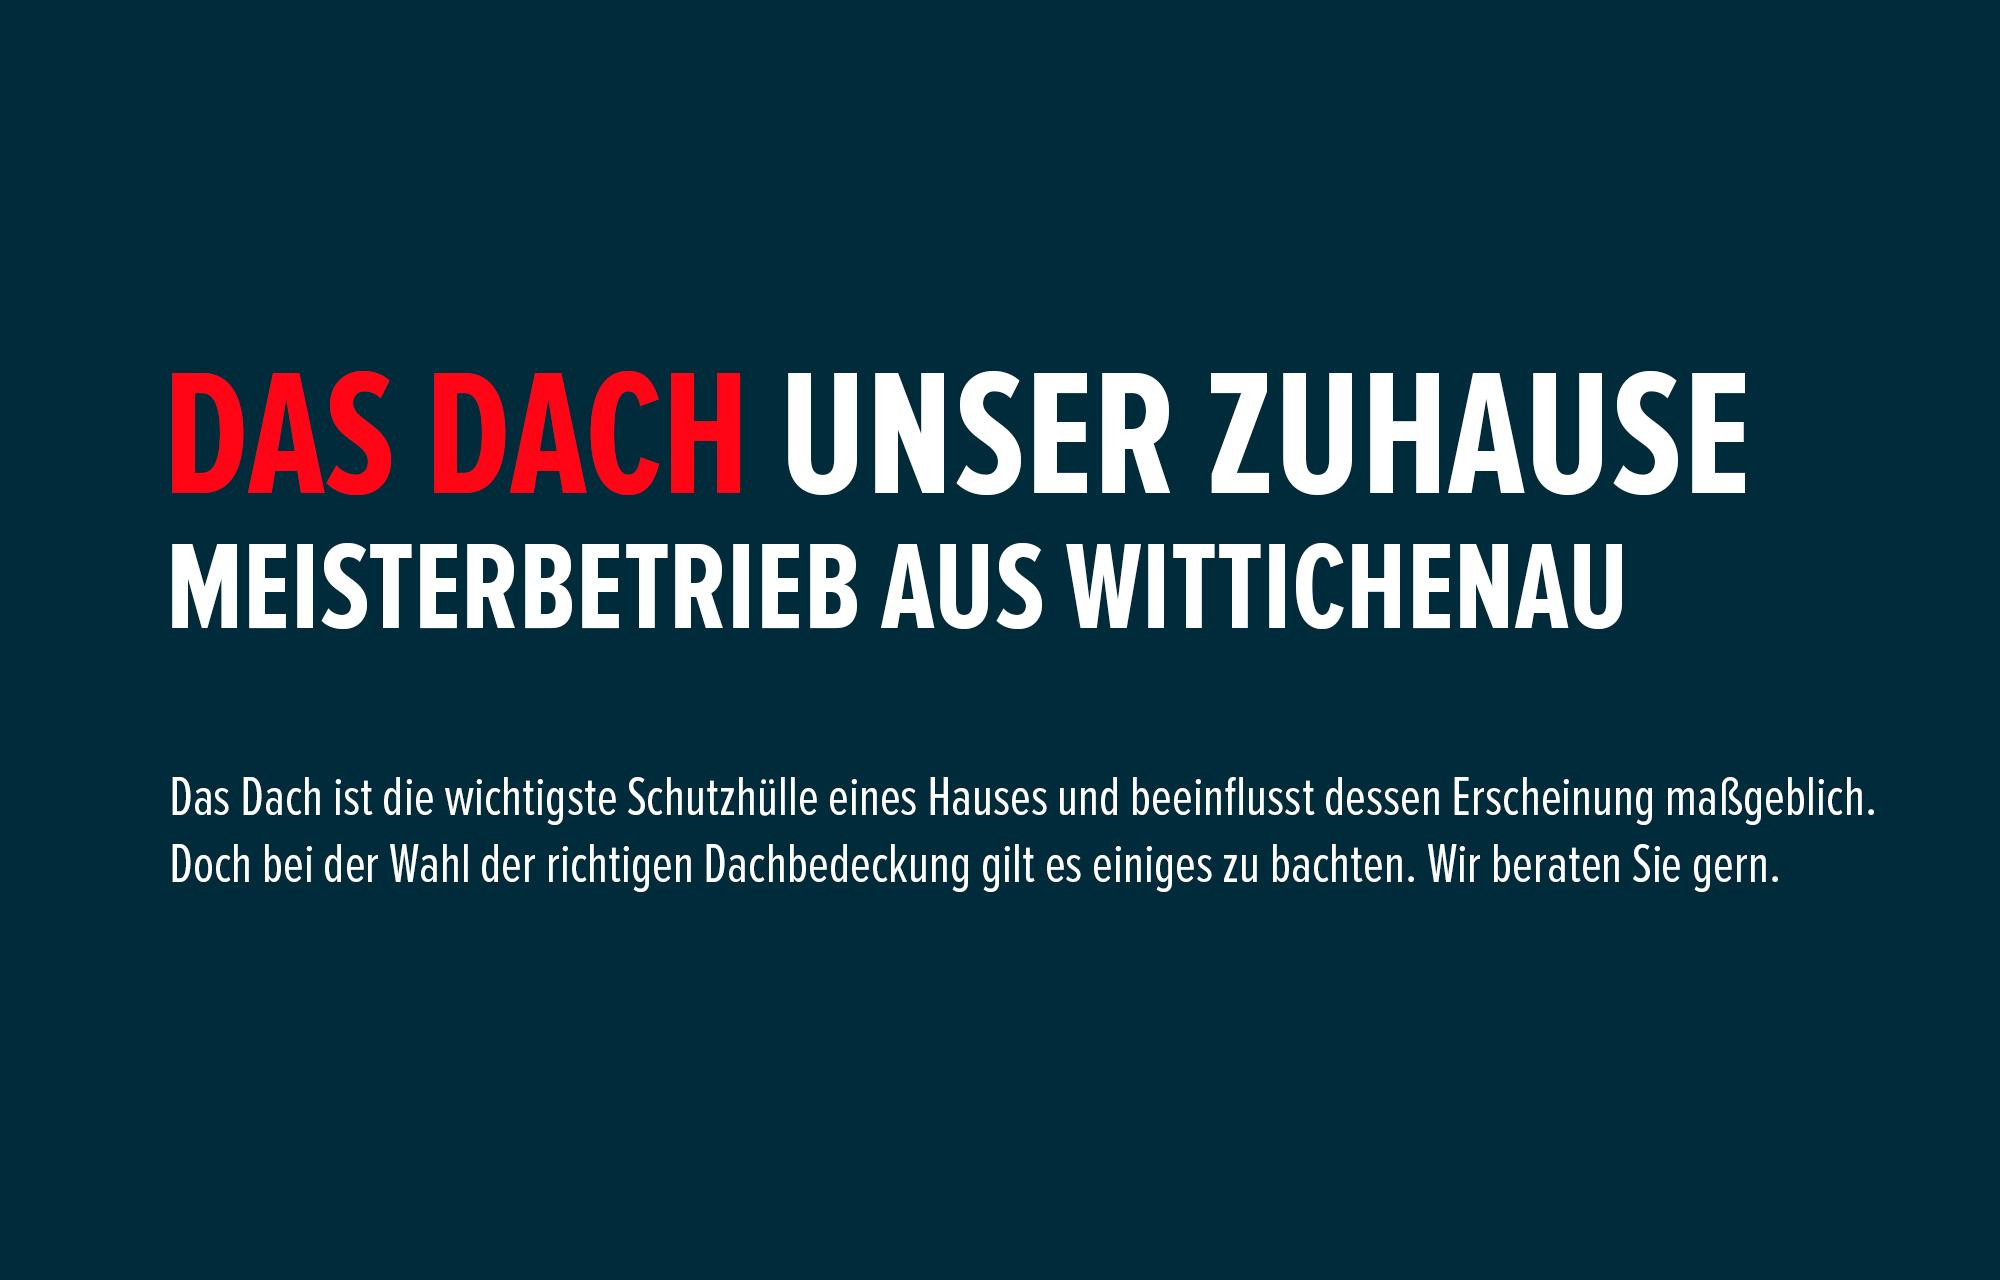 Dachdecker Wittichenau